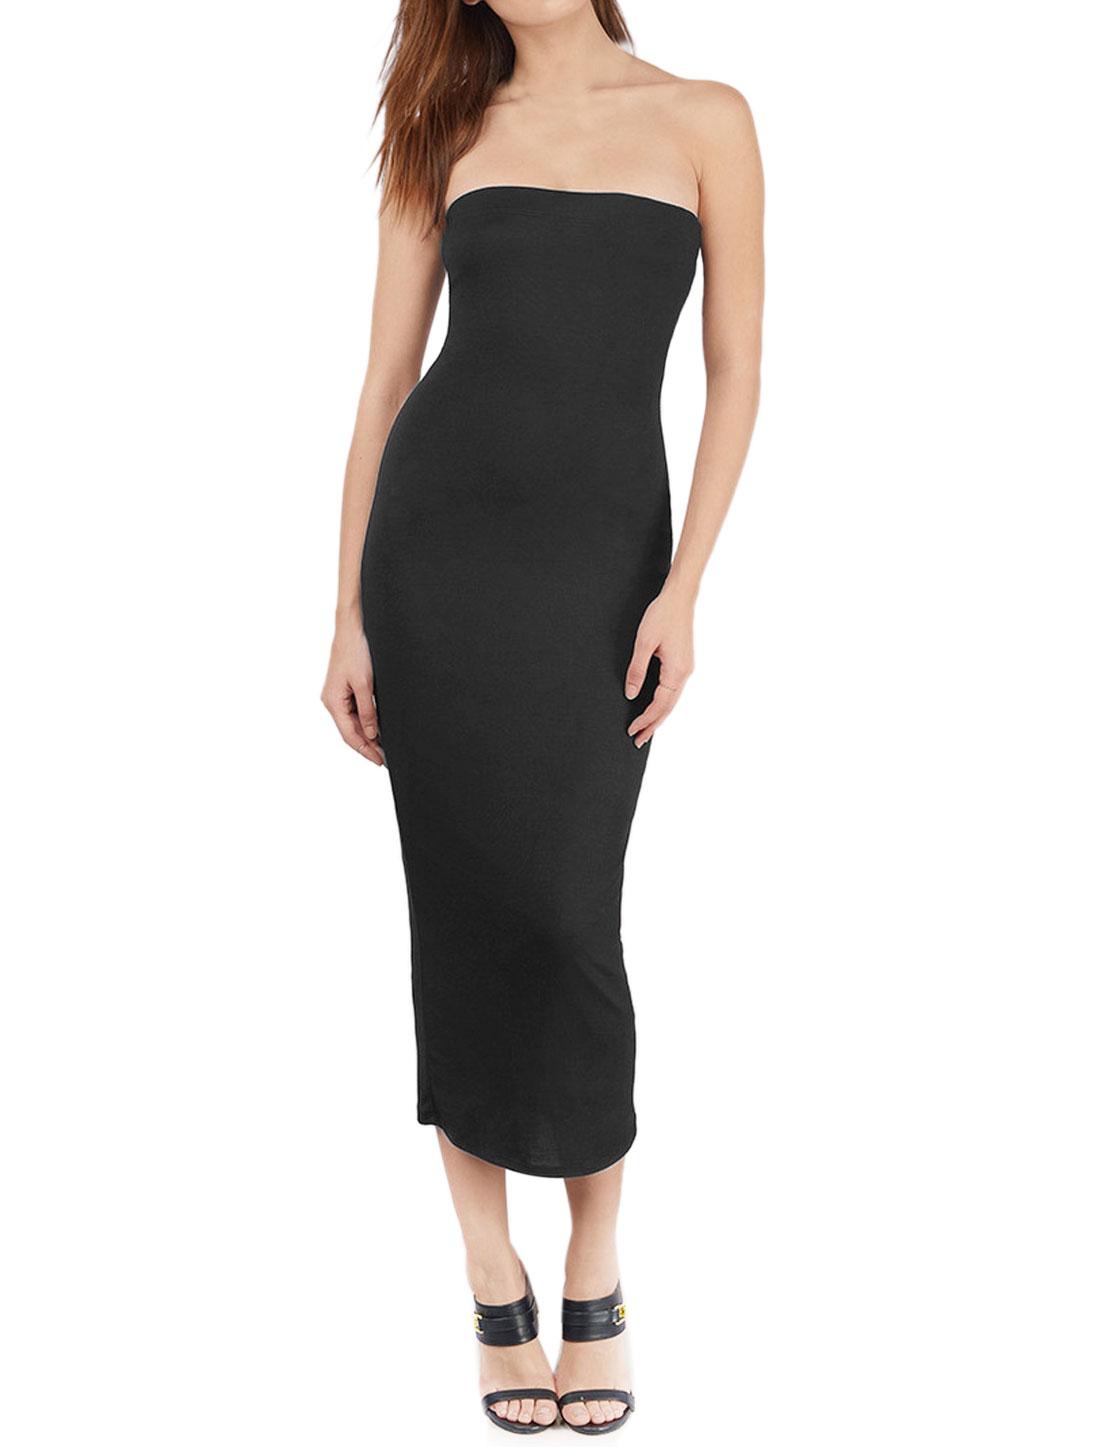 Women Elastic Upper Strapless Bodycon Midi Dress Black M